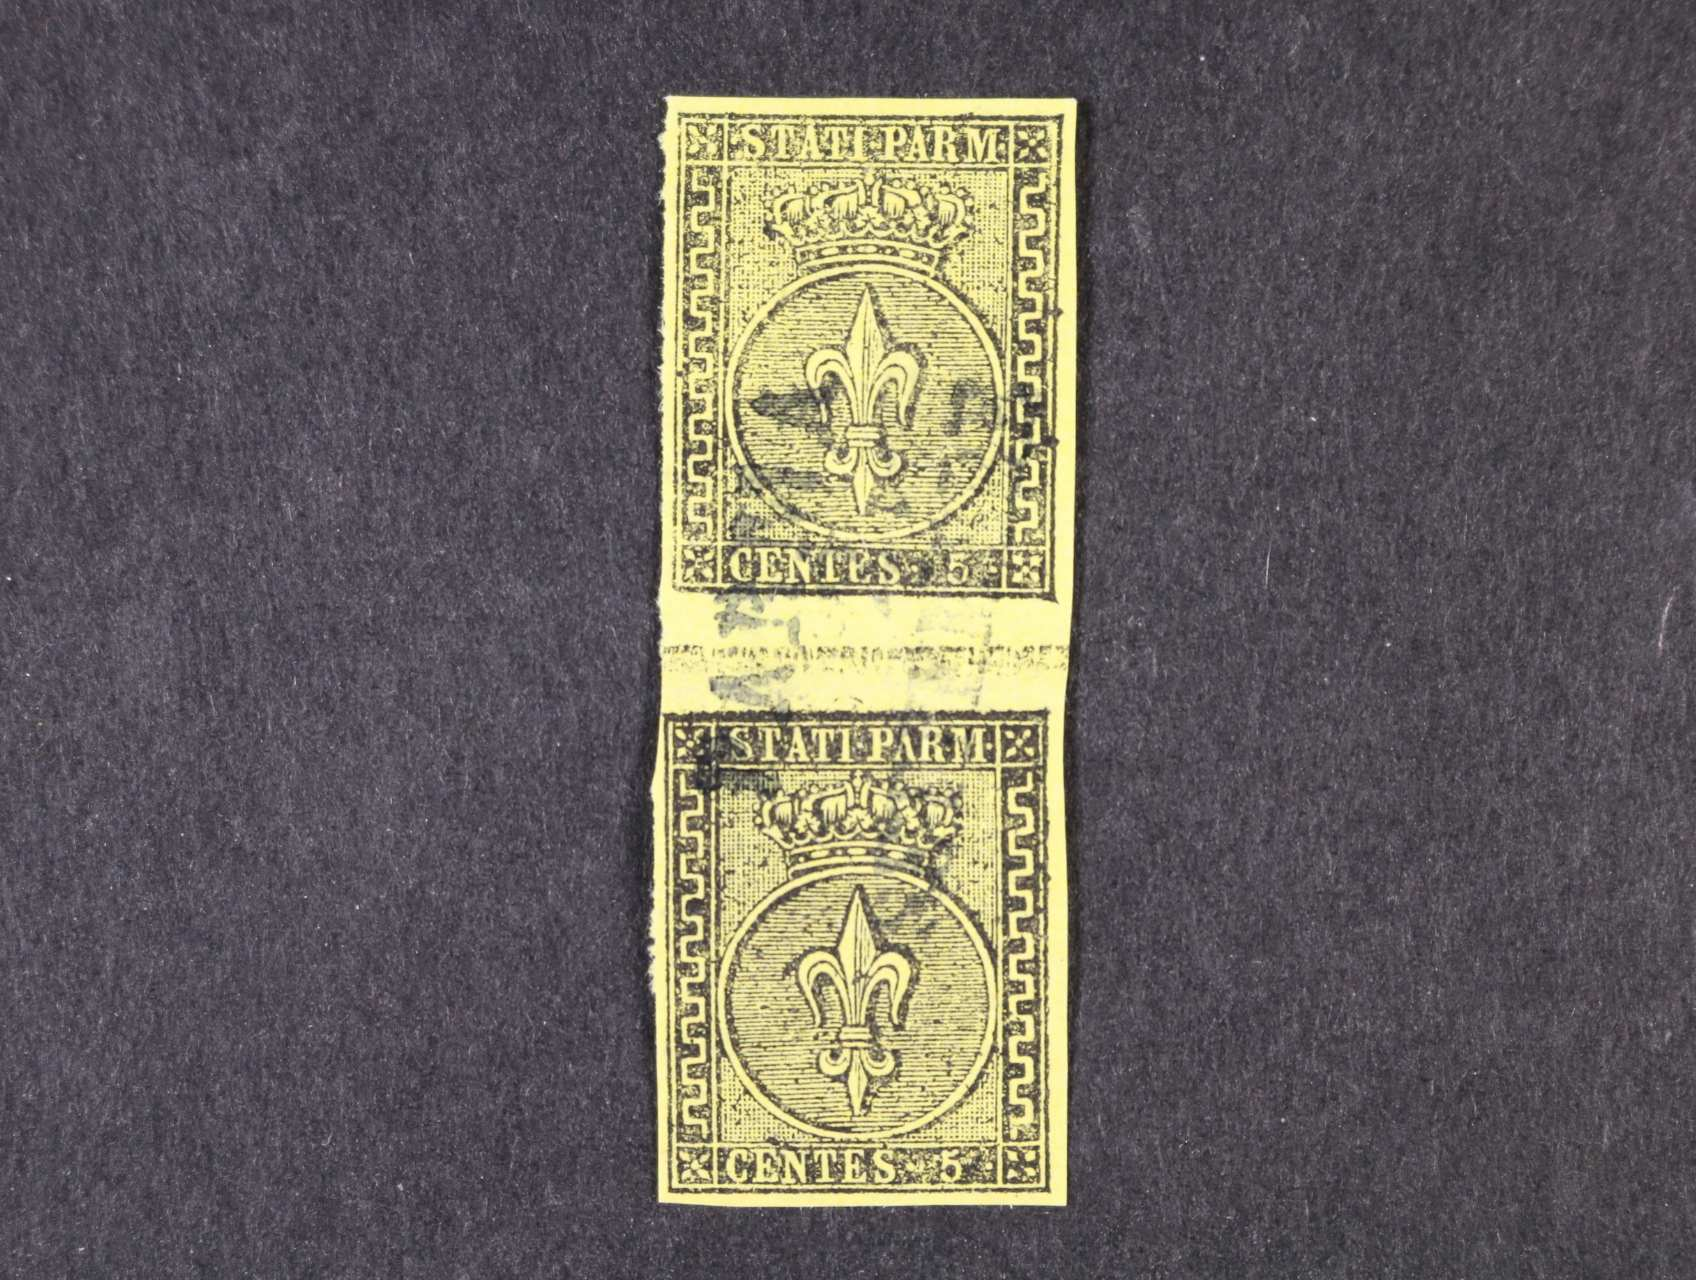 Parma - zn. Sas. č. 1 - svislé meziarší, zk. Sorani, 8000 EUR